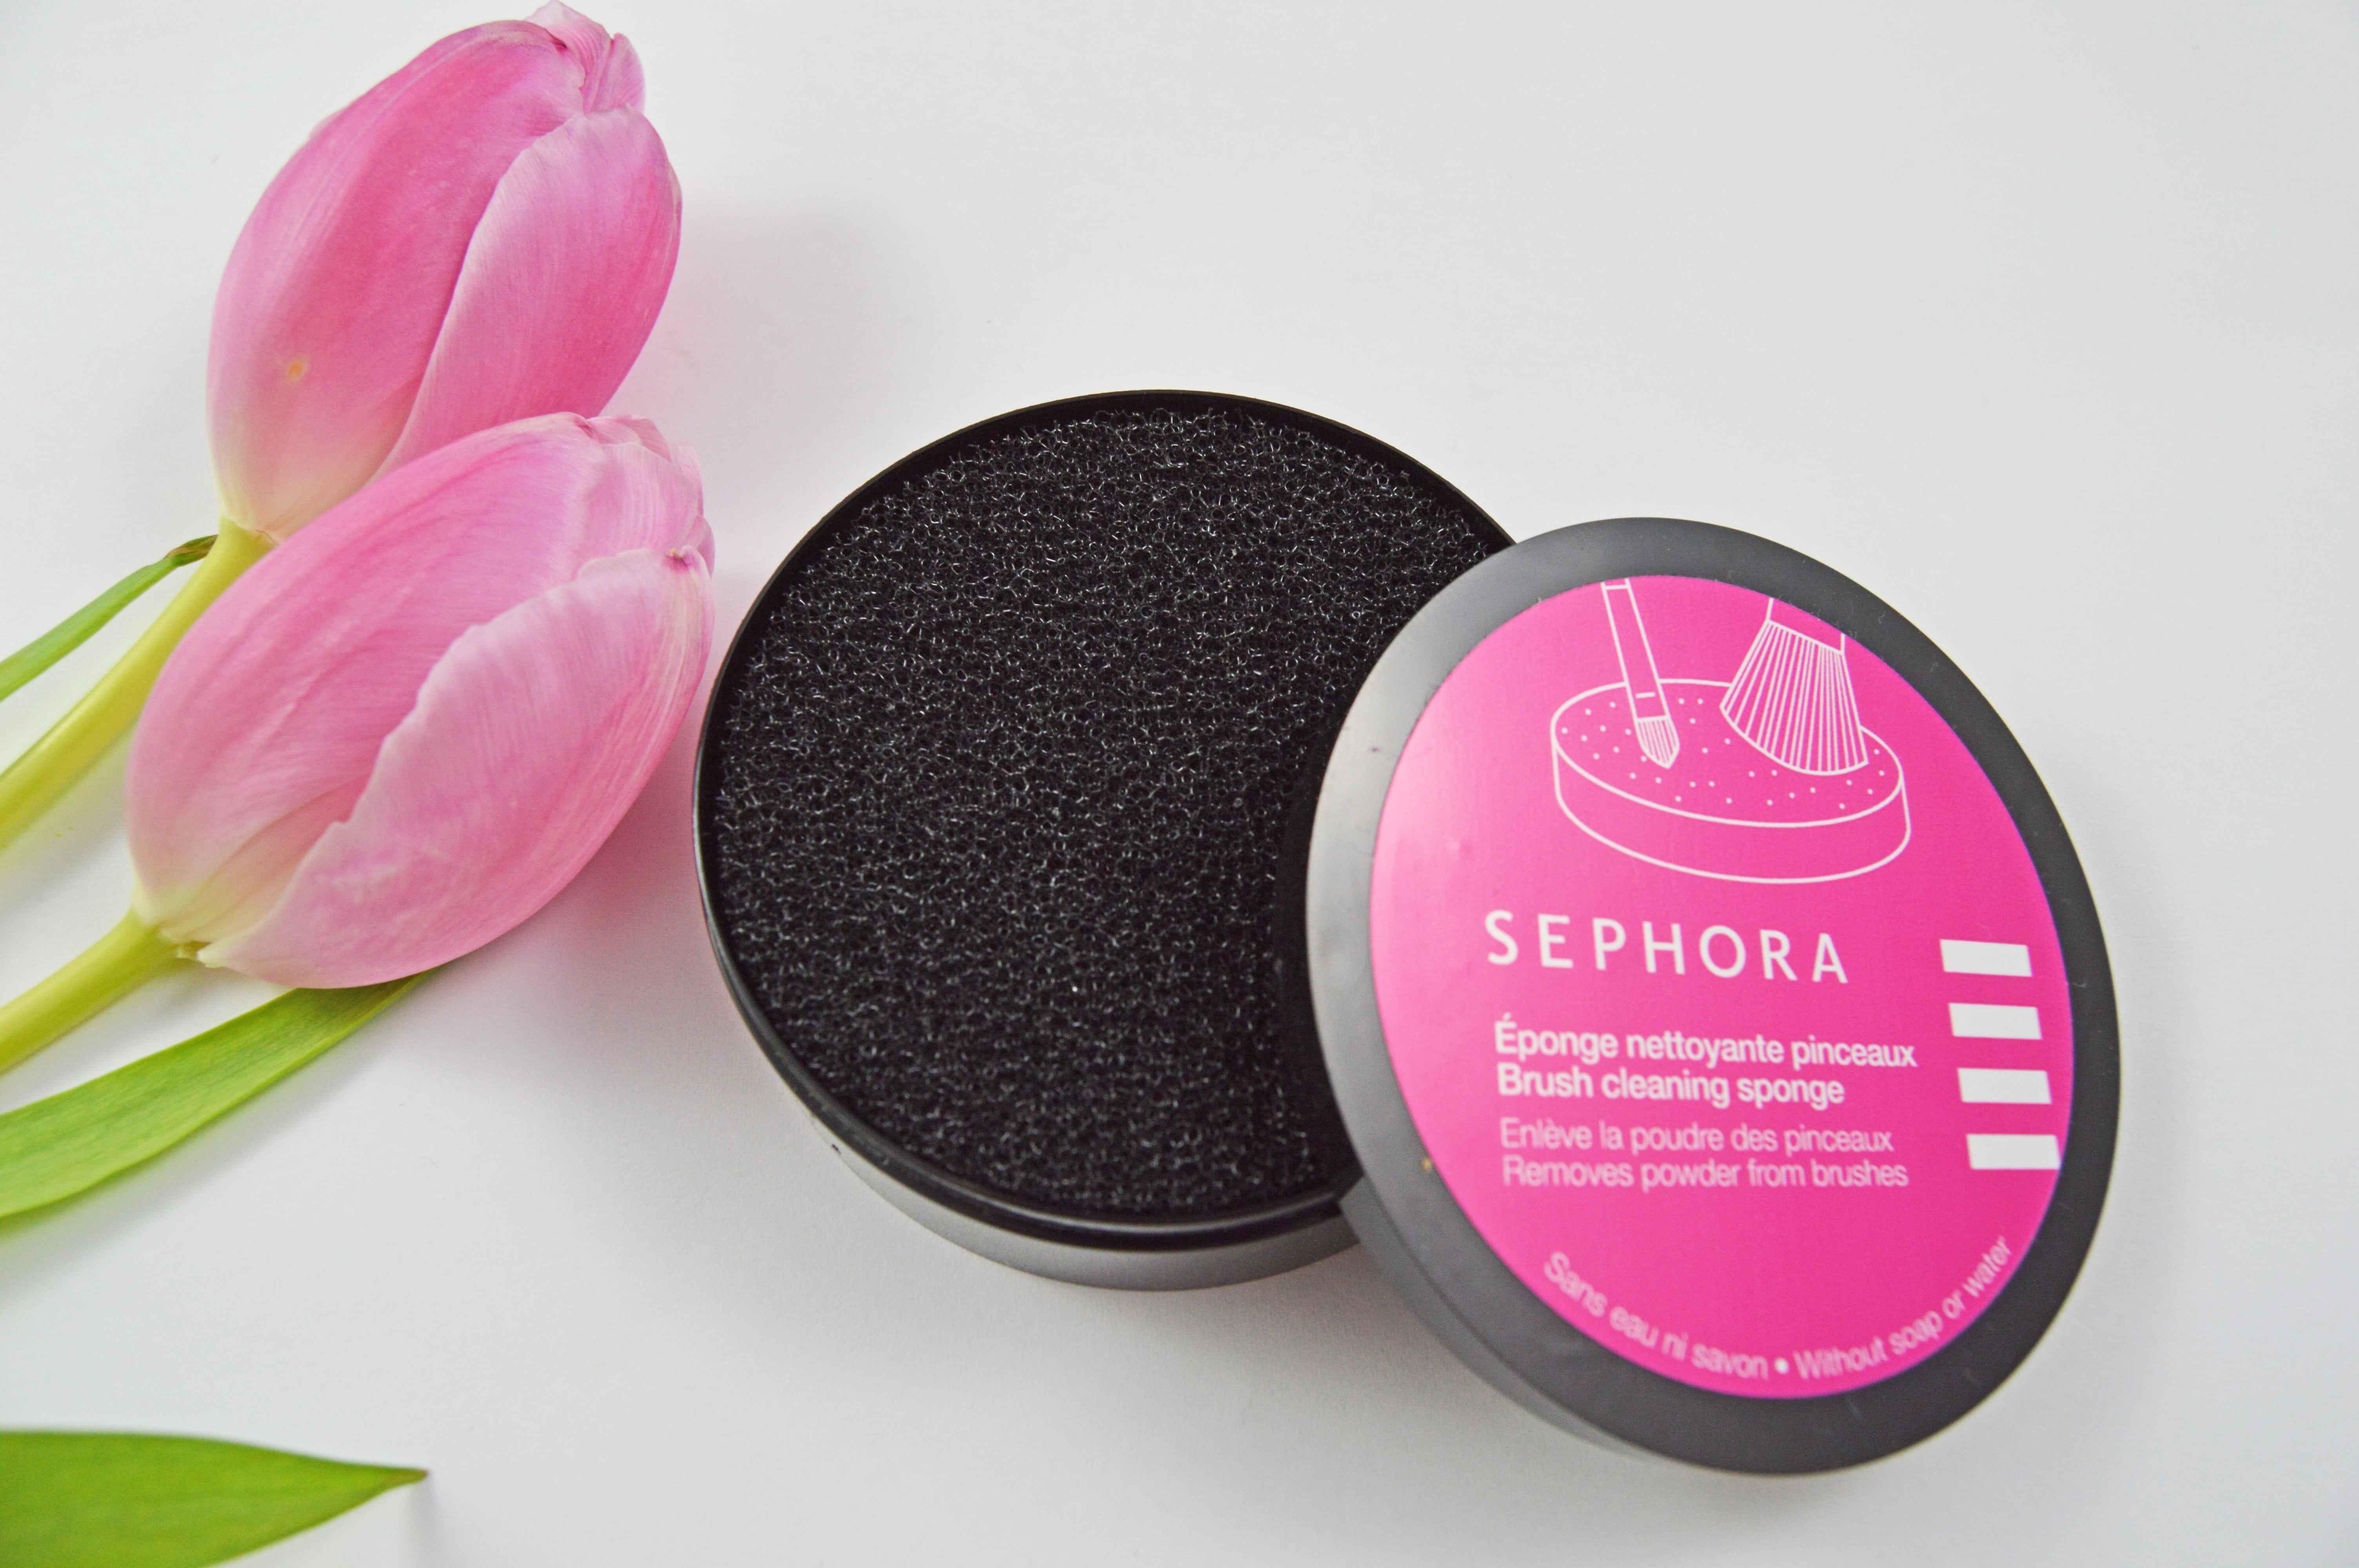 Made in Sephora - Brush cleaning sponge